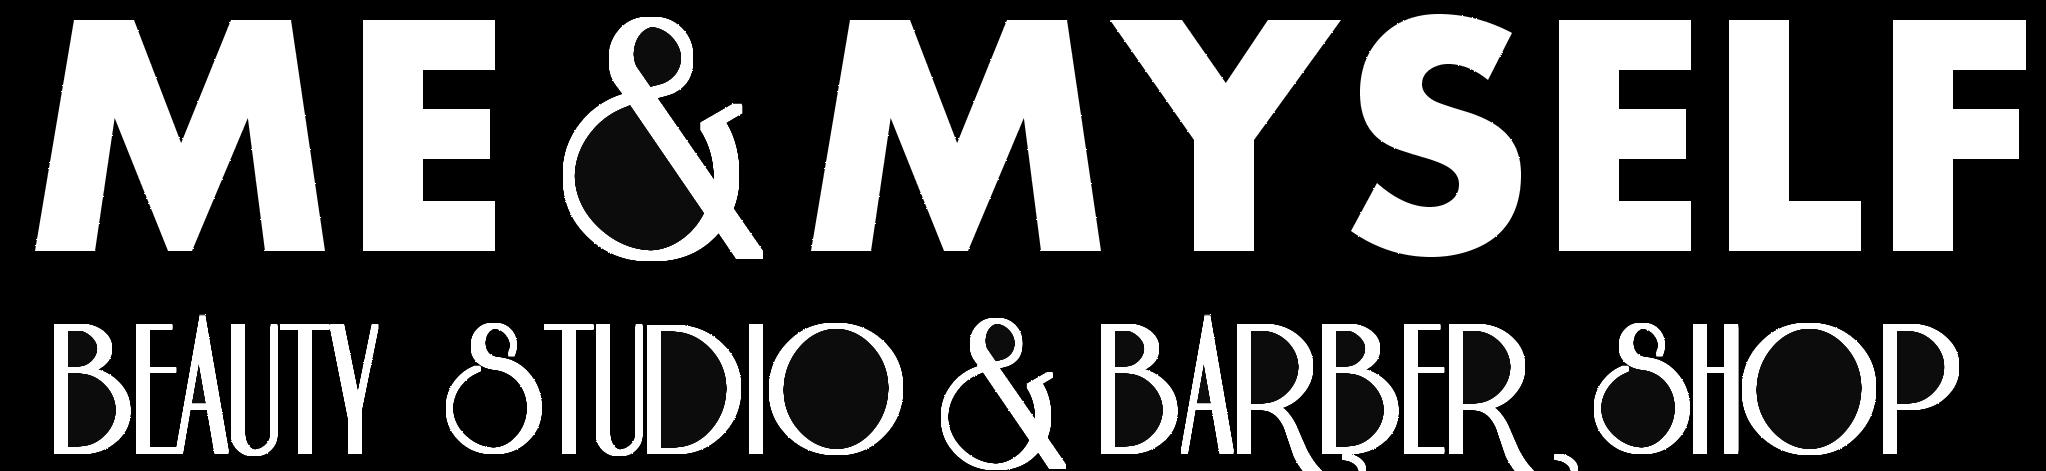 Me&Myself Beauty Studio&Barber Shop